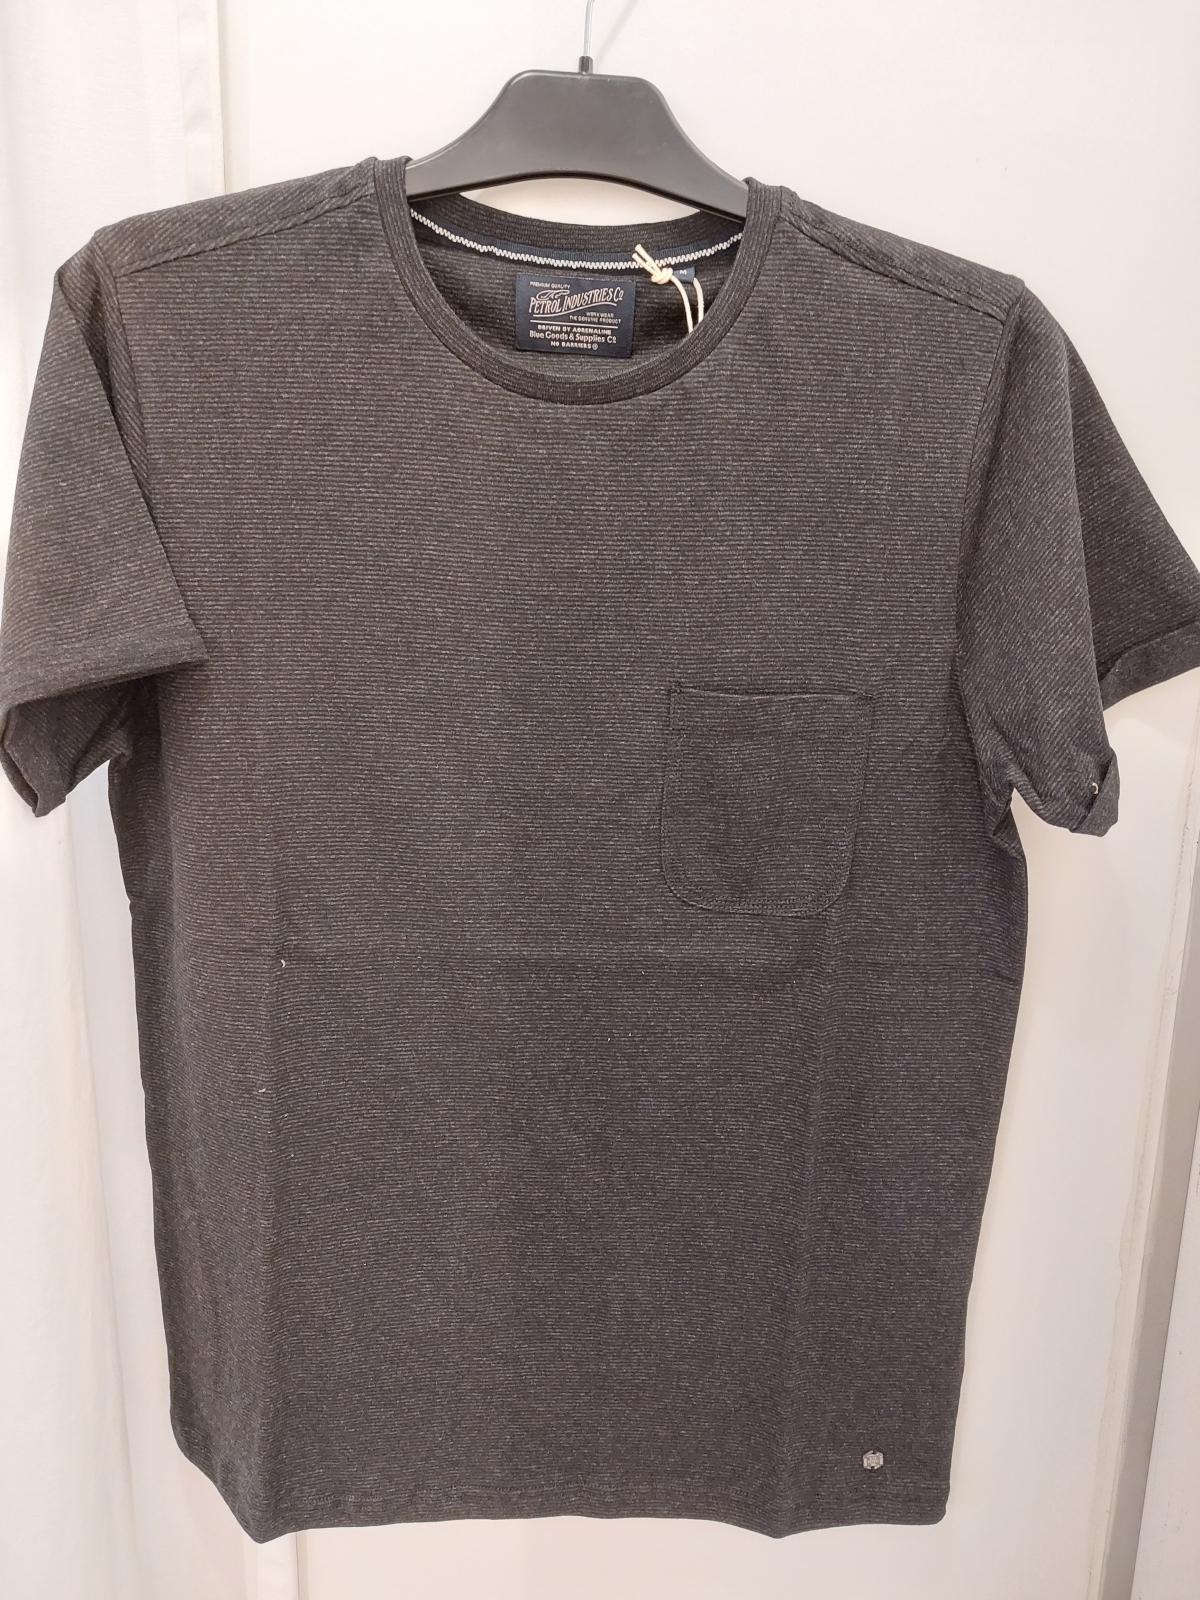 T shirt black borstzakje